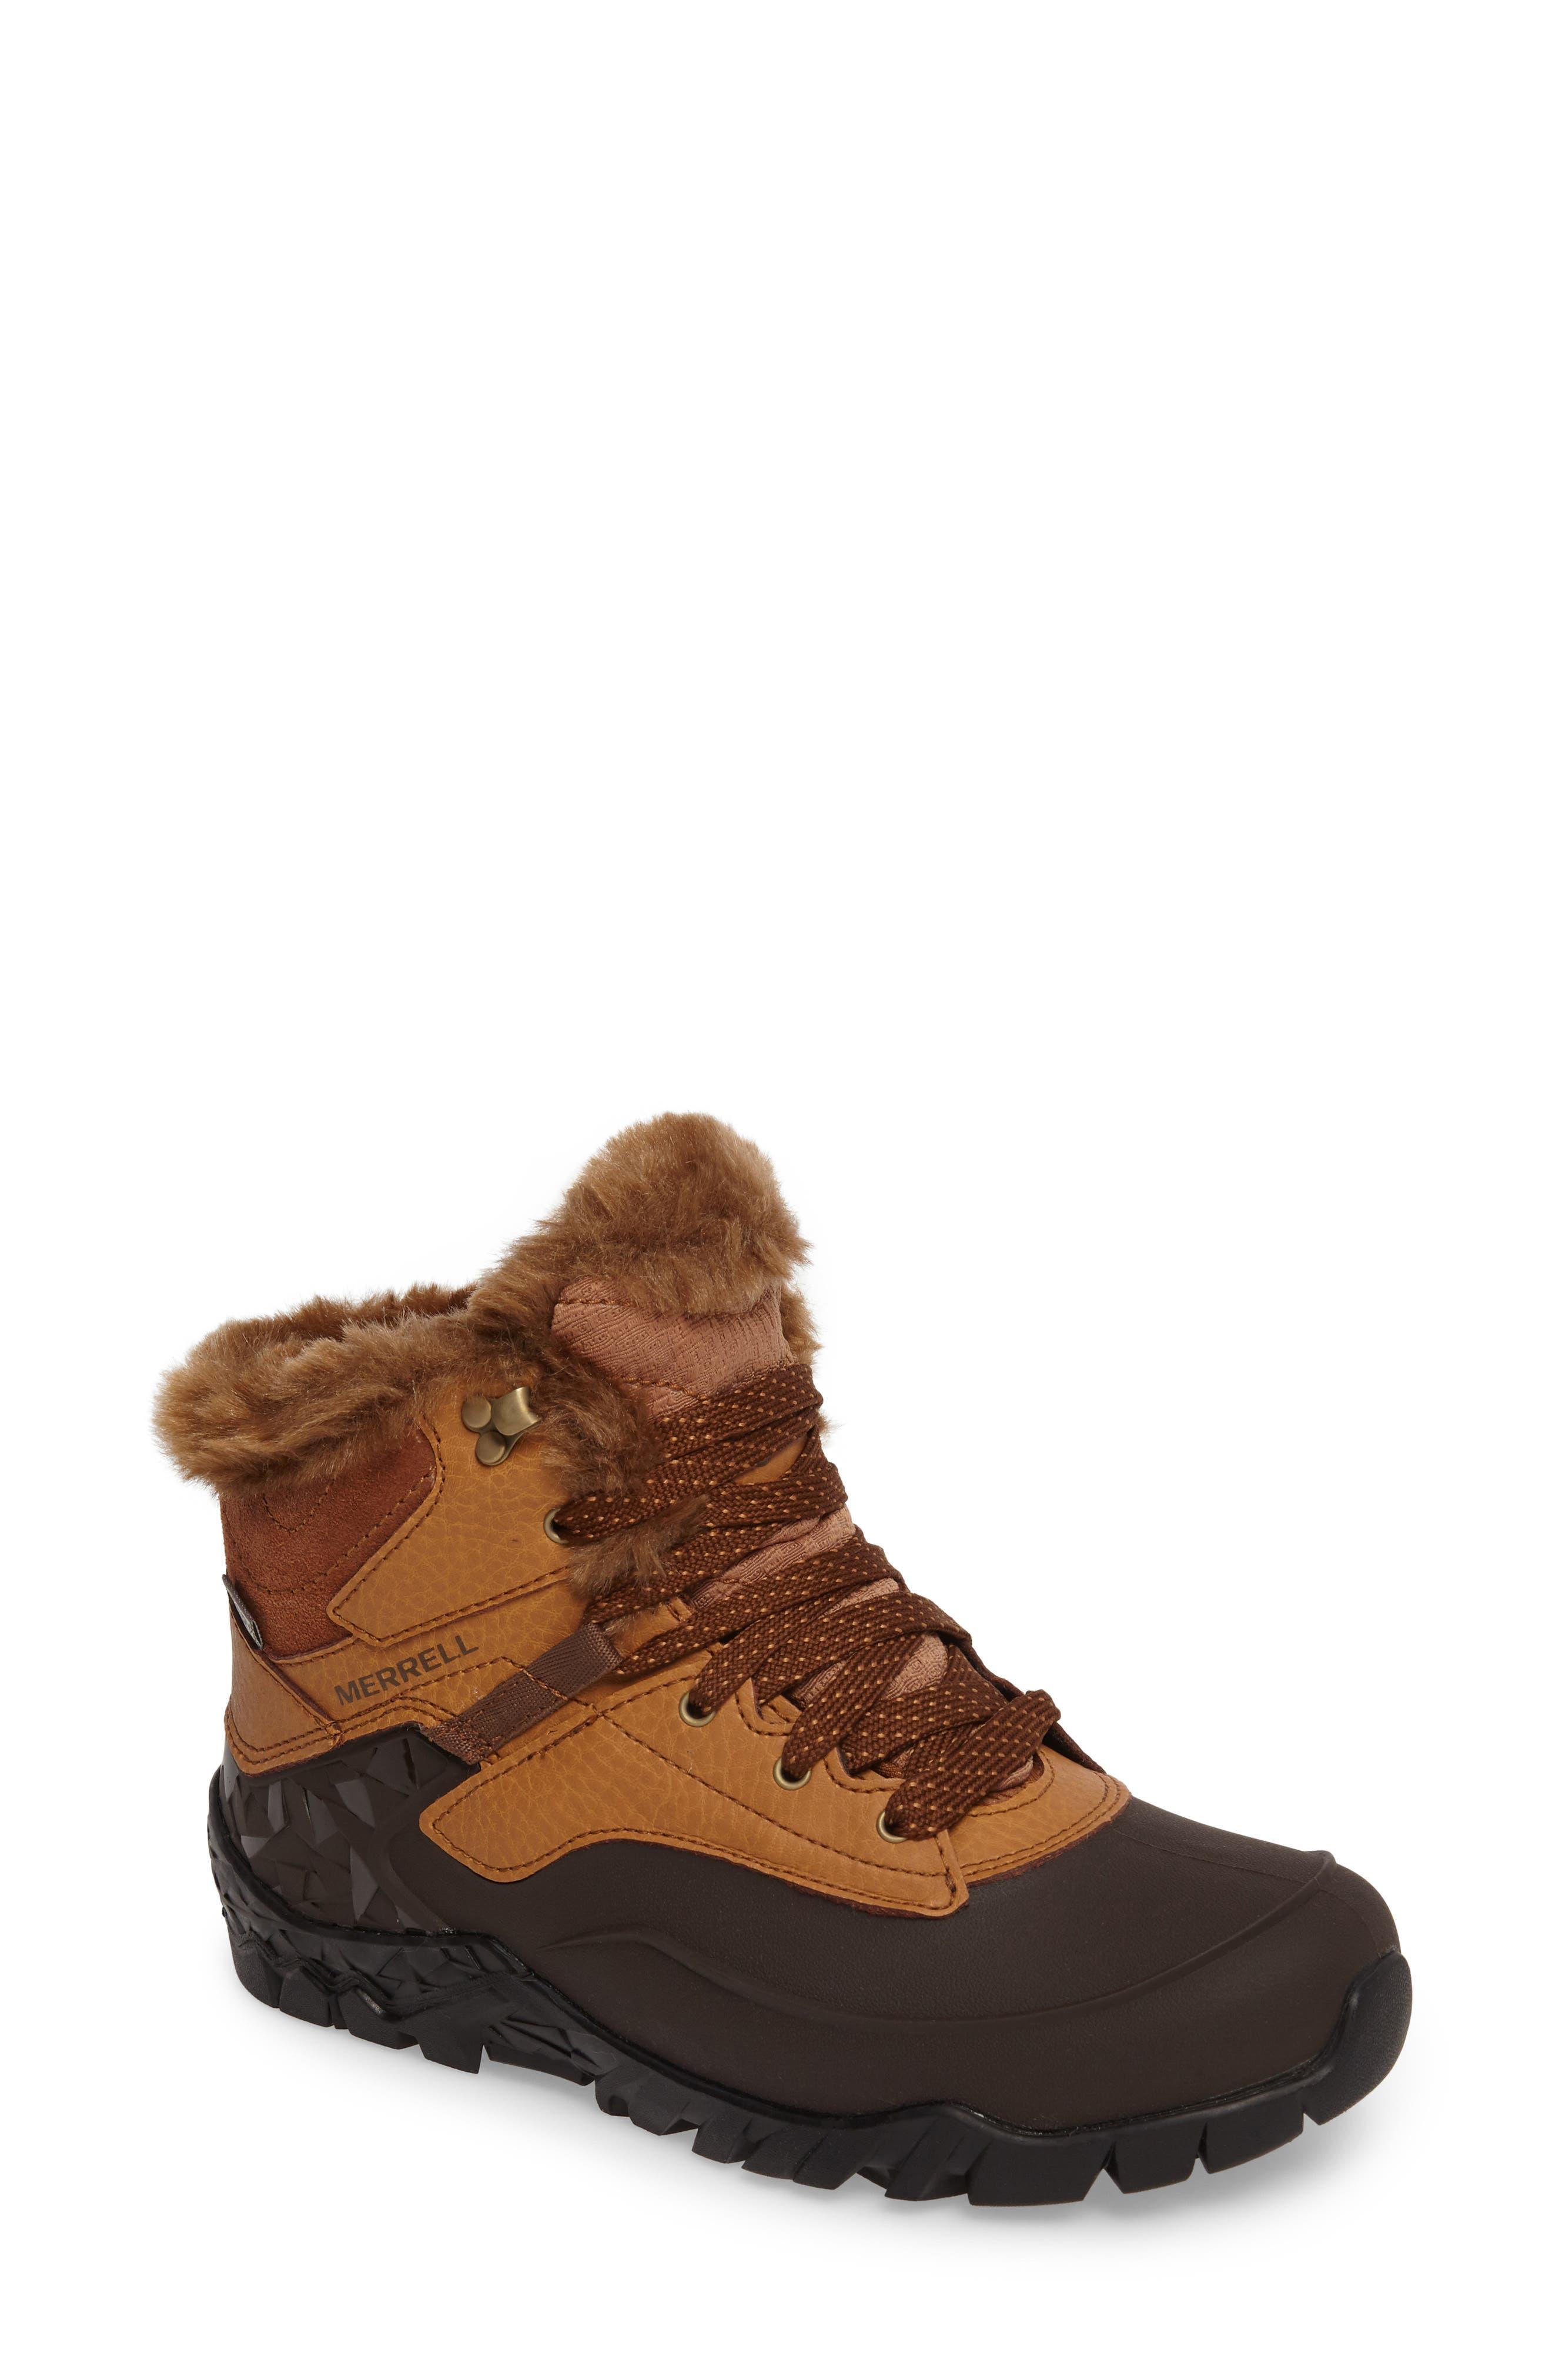 Alternate Image 1 Selected - Merrell Aurora 6 Ice+ Waterproof Boot (Women)